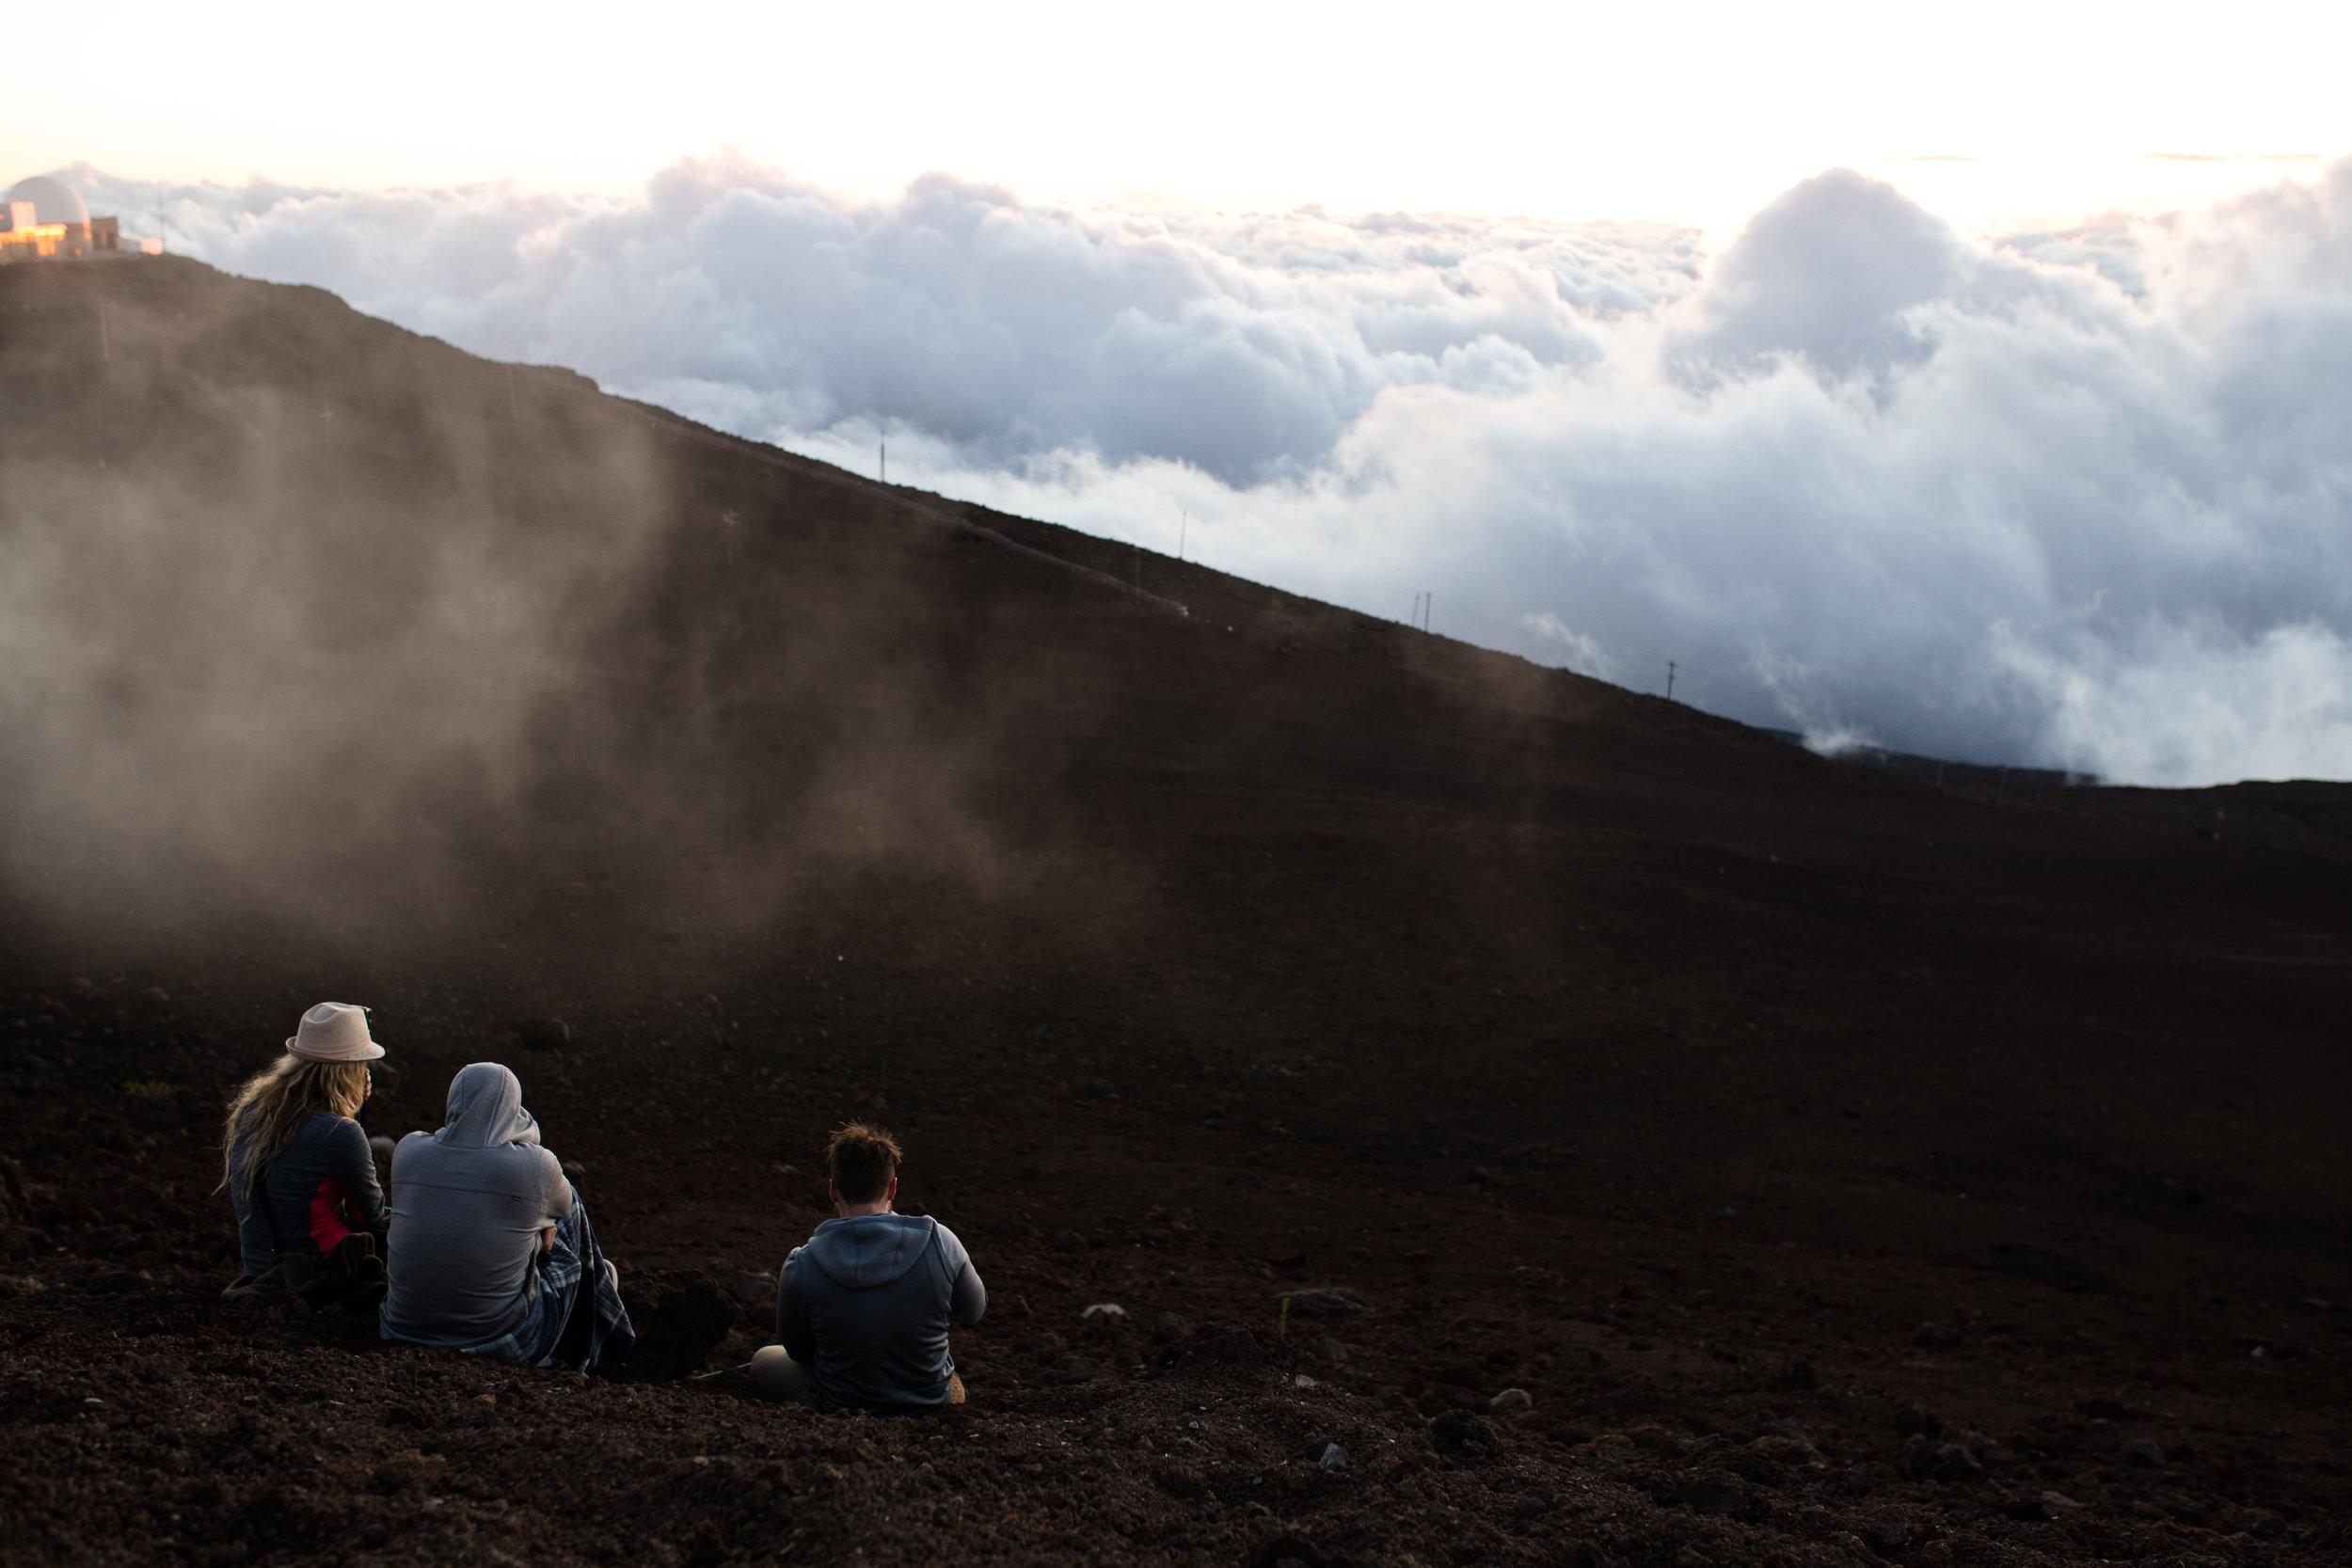 Watching the Sunset 10,000 ft above sea level at the peak of Haleakala